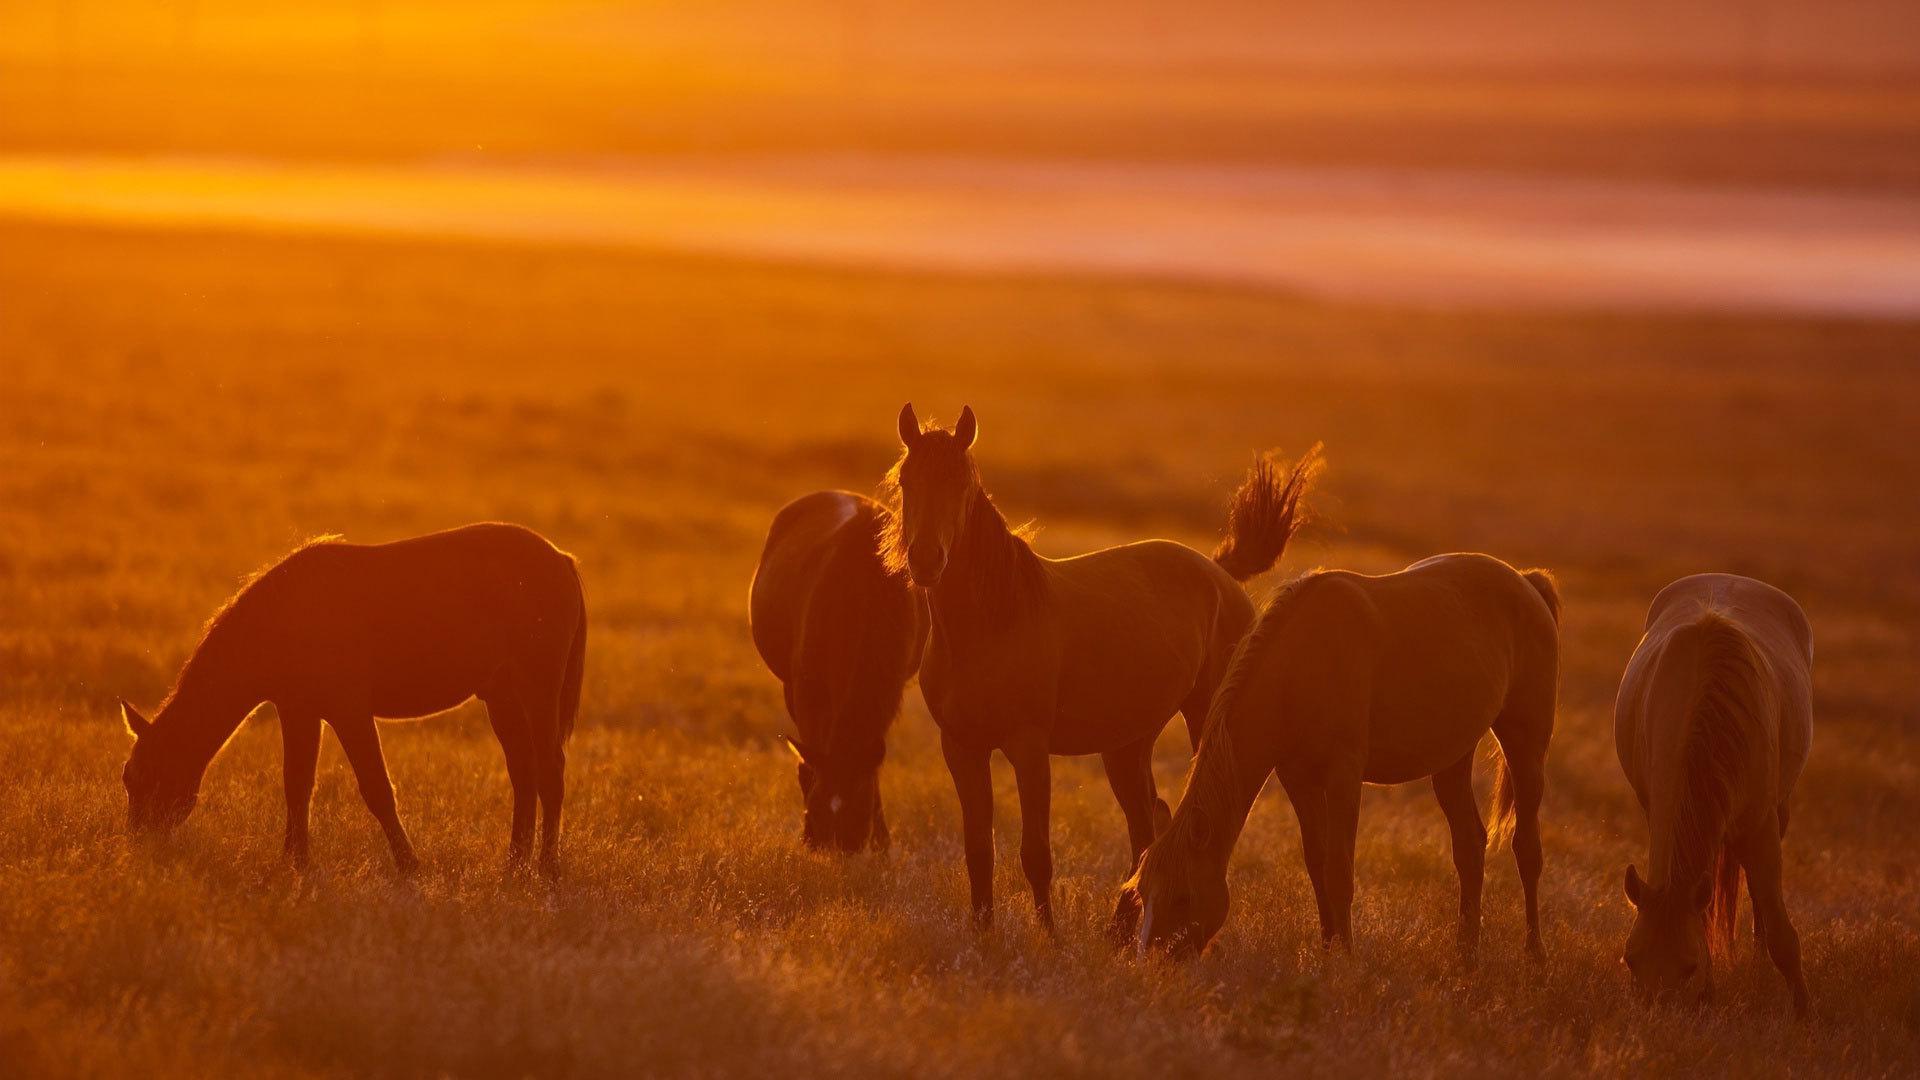 Horse sunset wallpaper